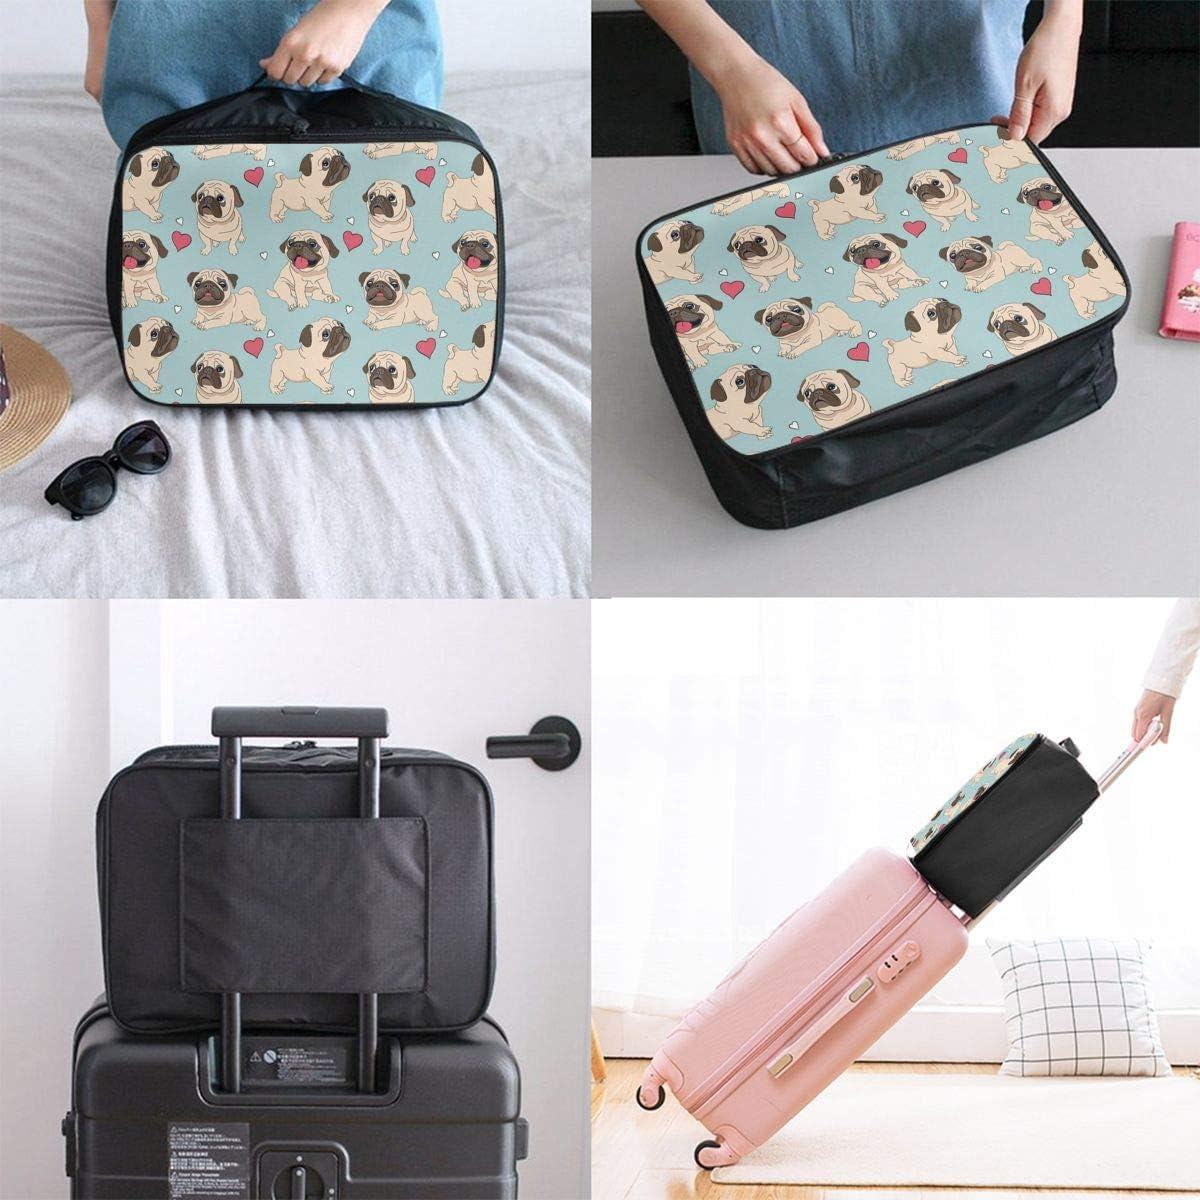 Love Pug Pattern Travel Carry-on Luggage Weekender Bag Overnight Tote Flight Duffel In Trolley Handle